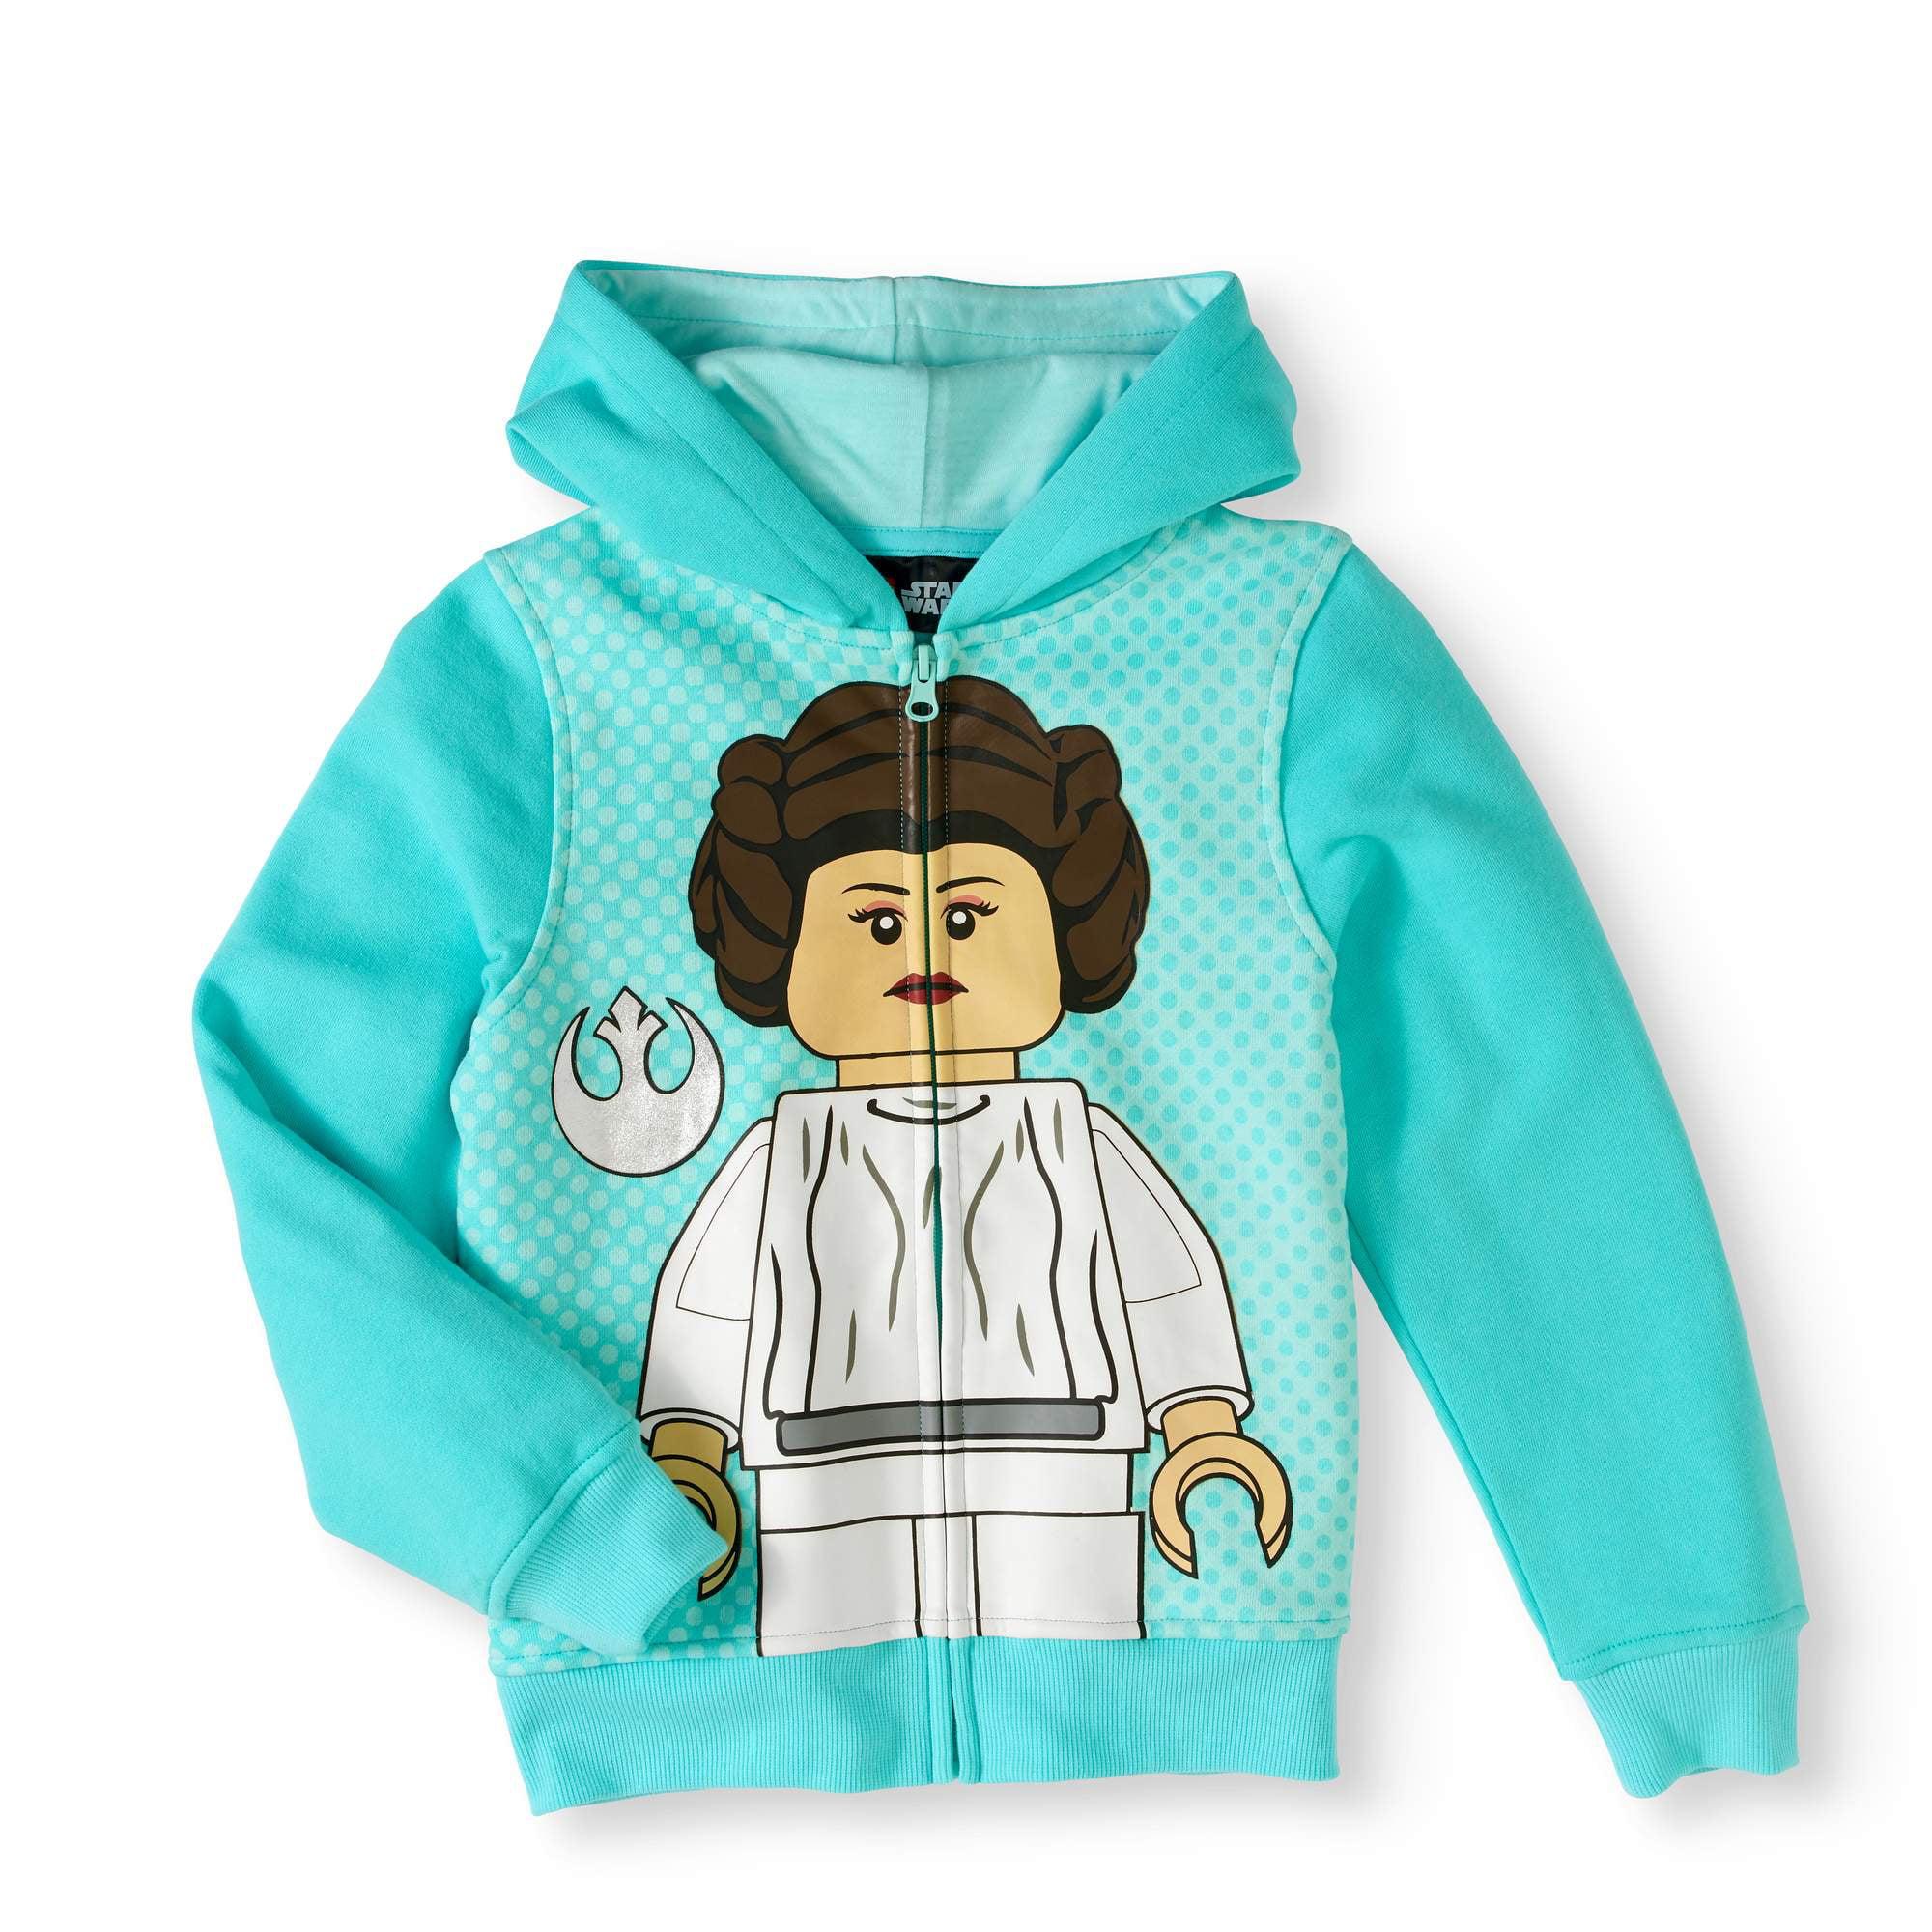 Girls' LEGO Star Wars Princess Leia Costume Zip-Up Hoodie